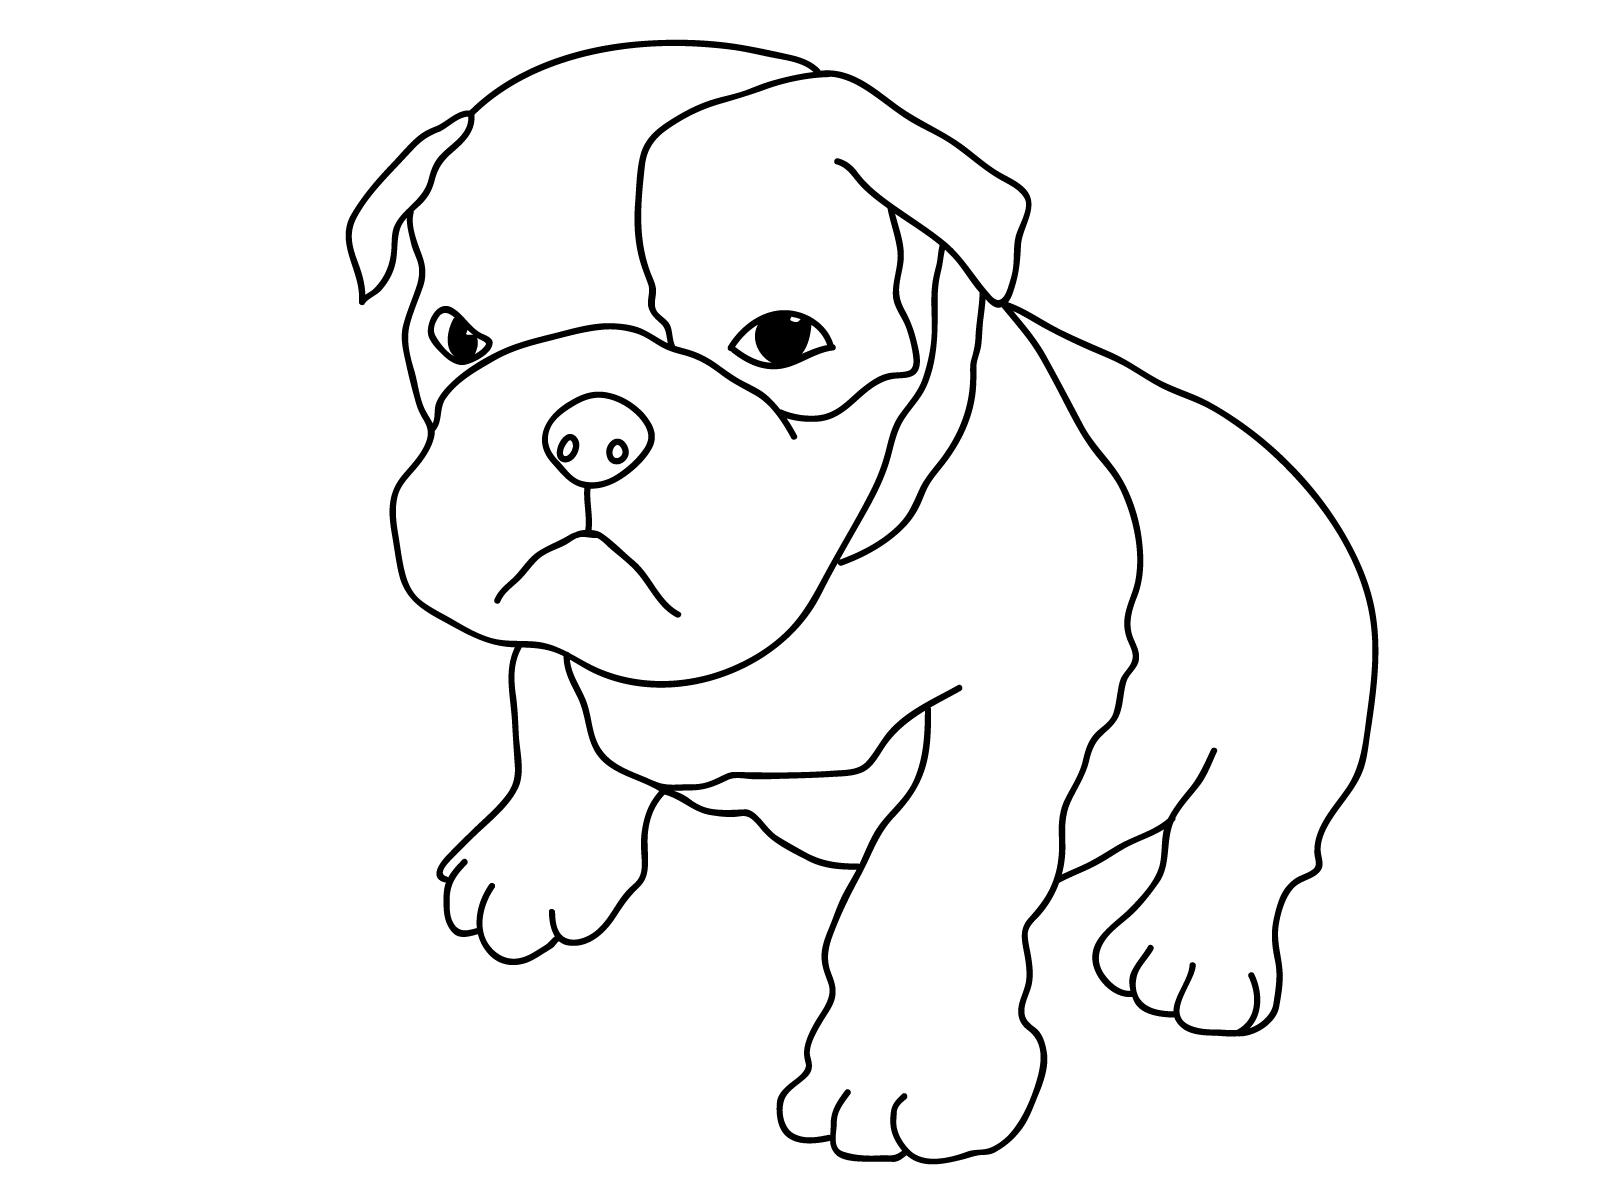 dog coloring pictures printable free printable dog coloring pages for kids coloring pictures dog printable